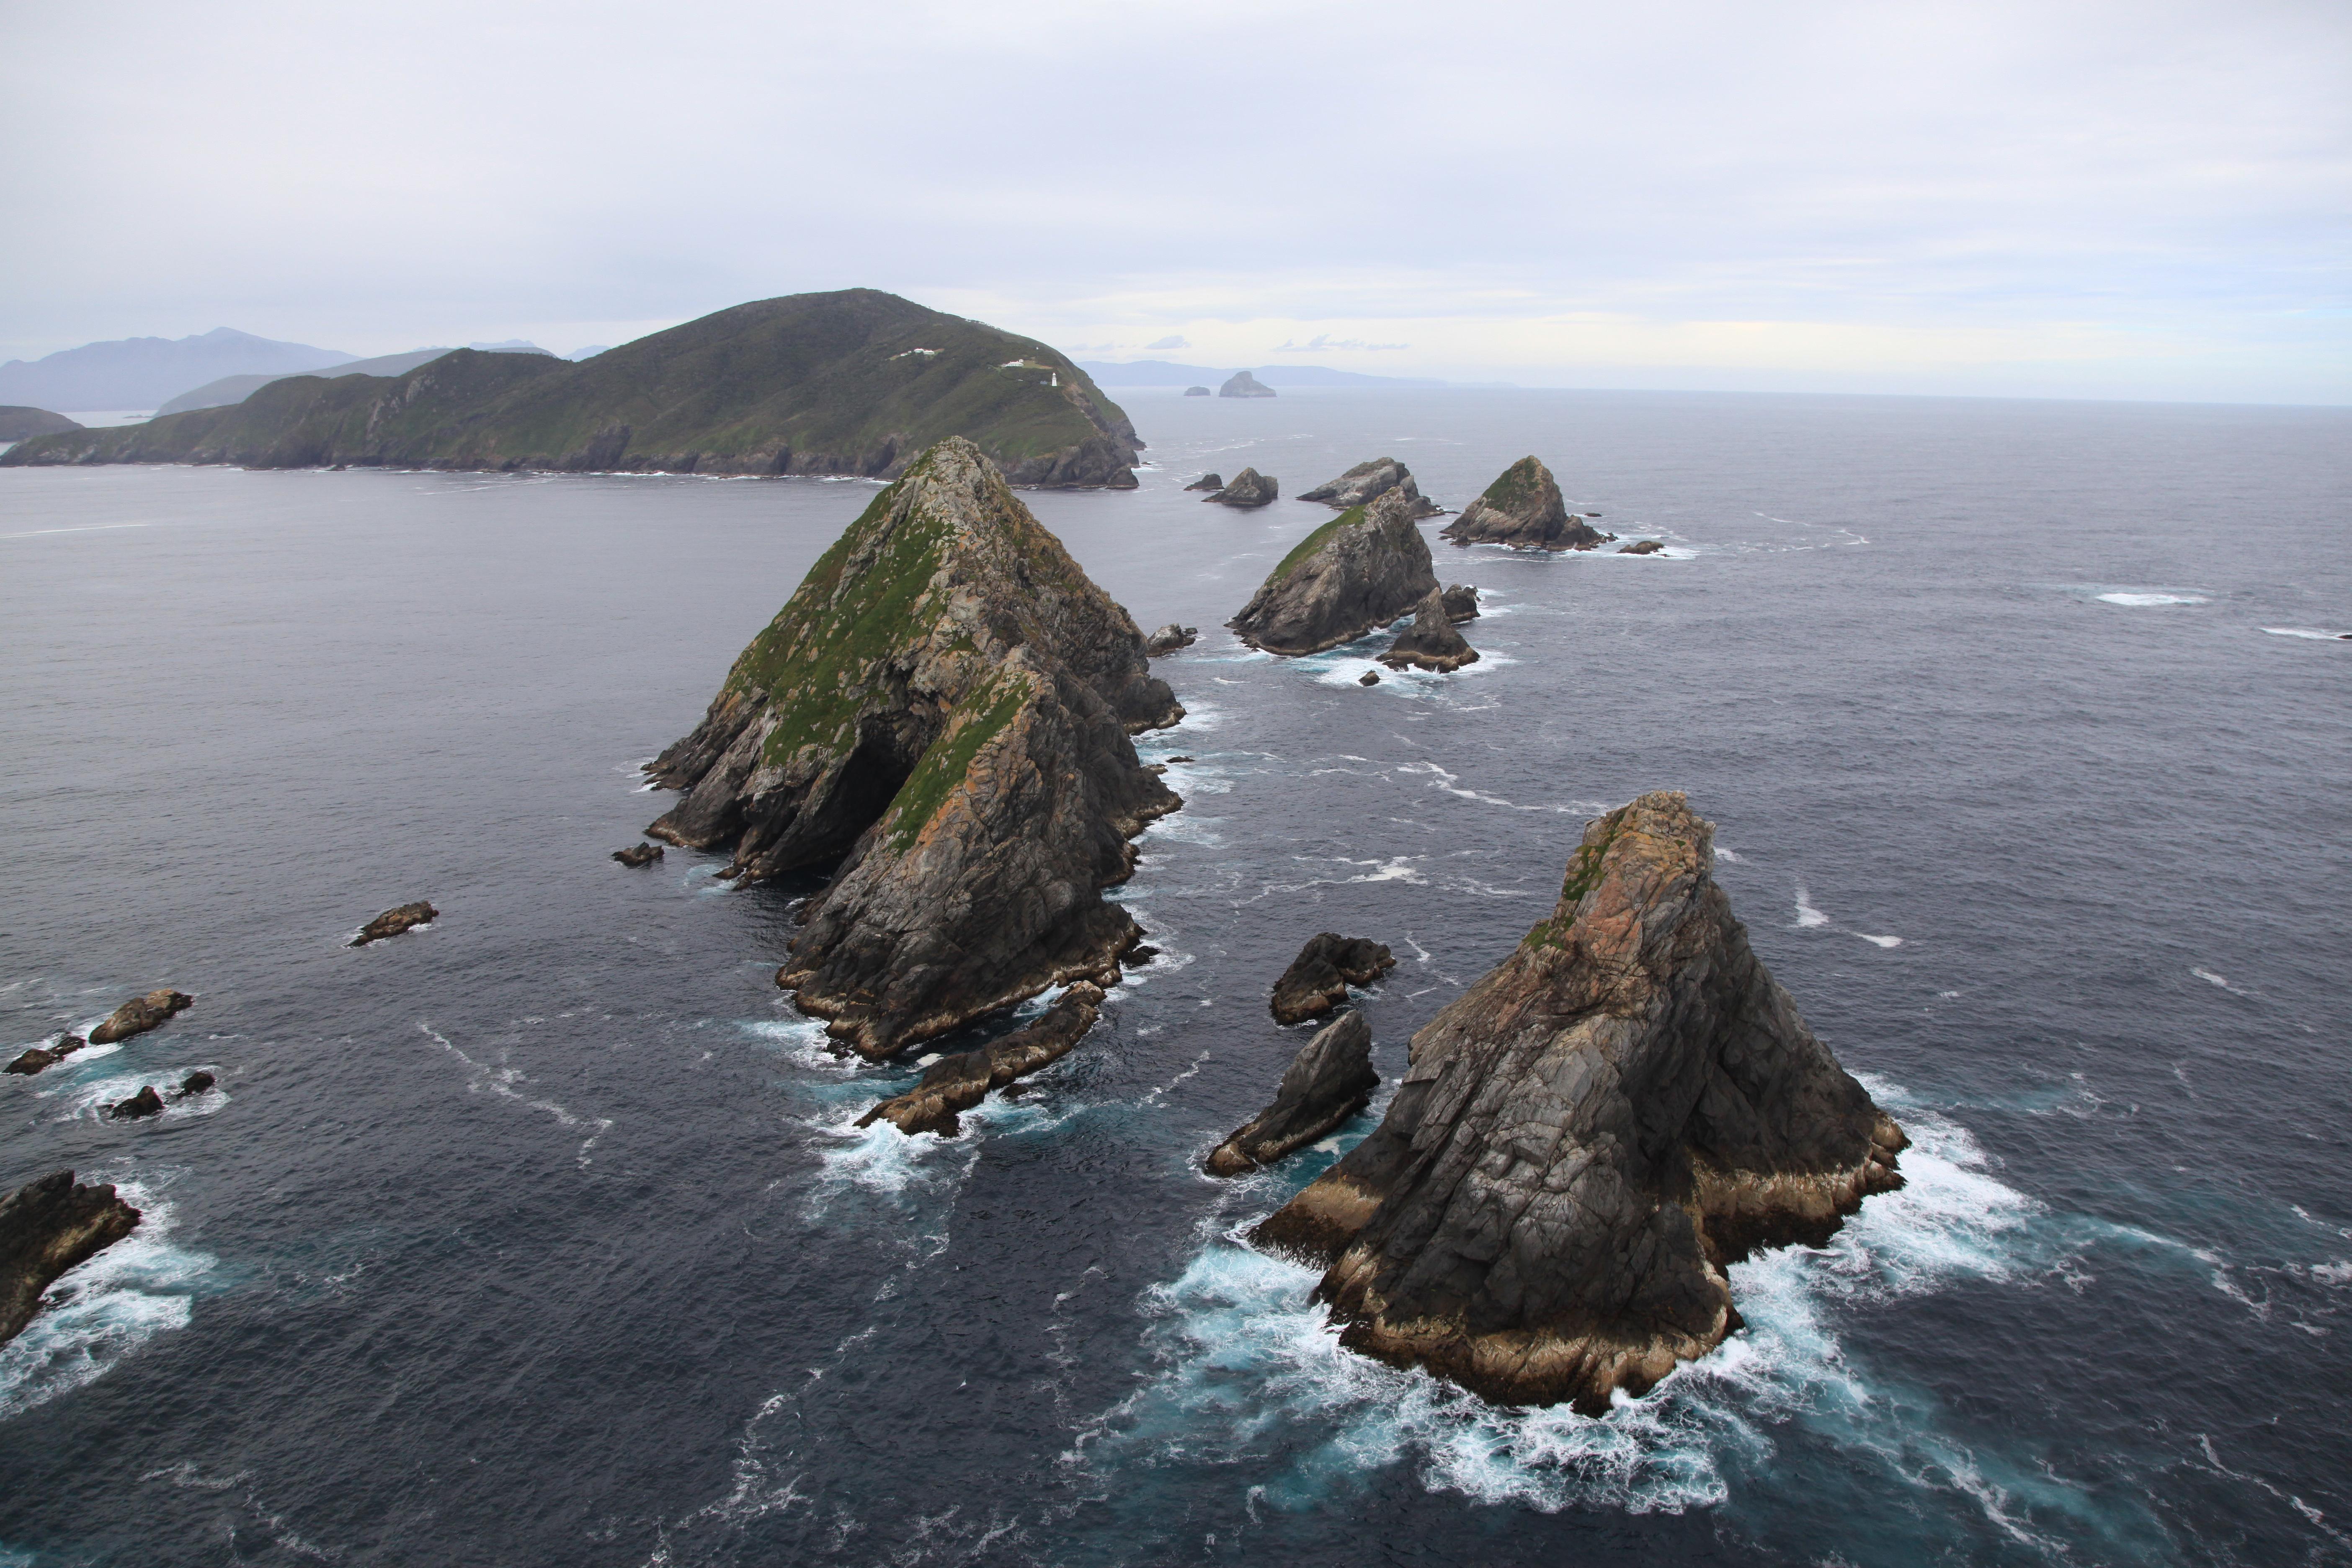 Maatsuyker Island with Needle Rocks in foreground